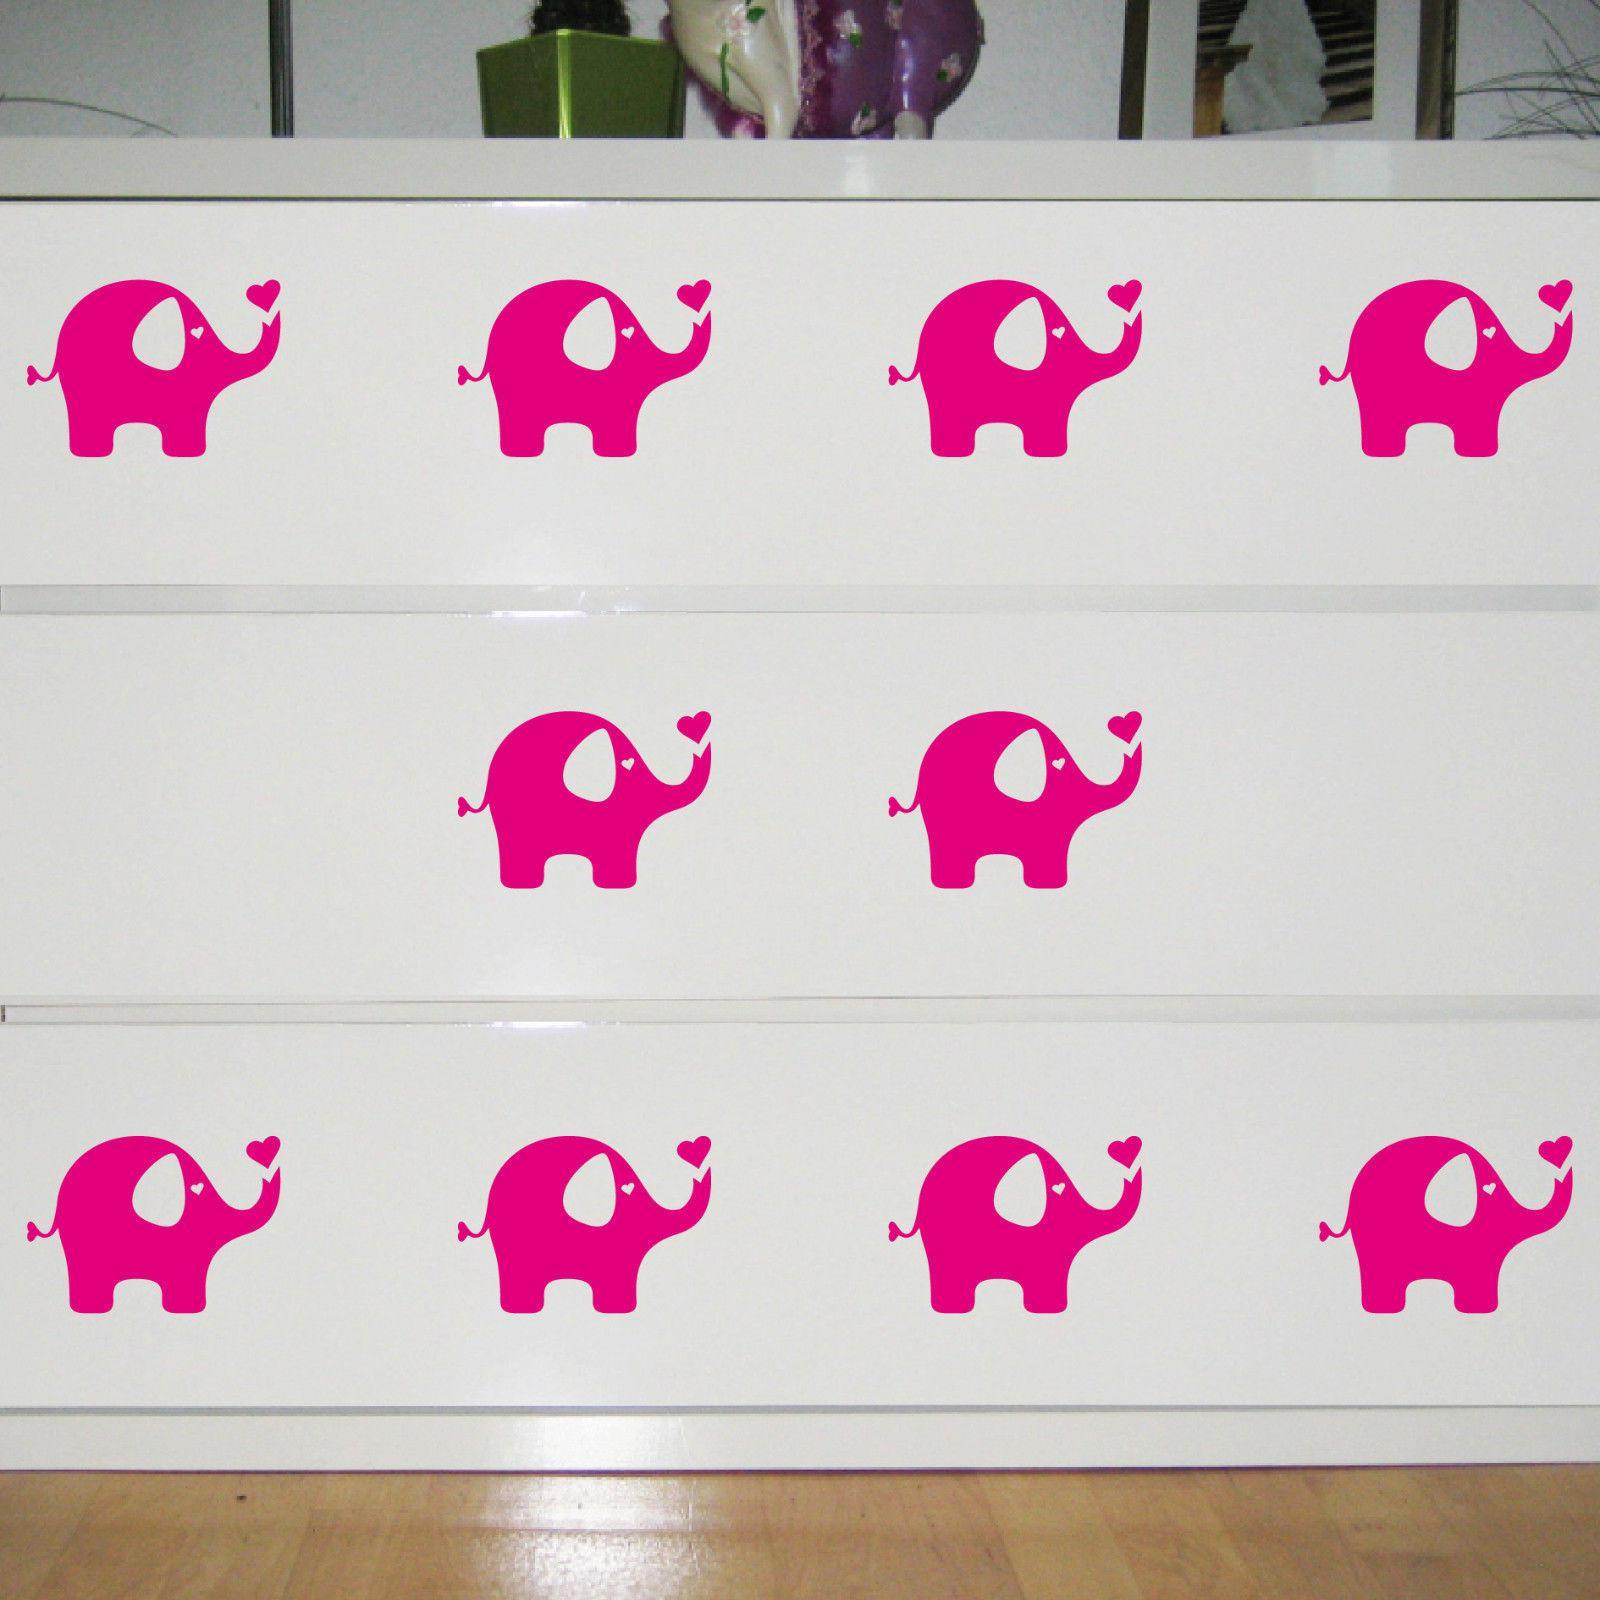 10 Aufkleber Elefant Pink 10cm Tattoo Deko Folie Kinderzimmer Möbel Fenster